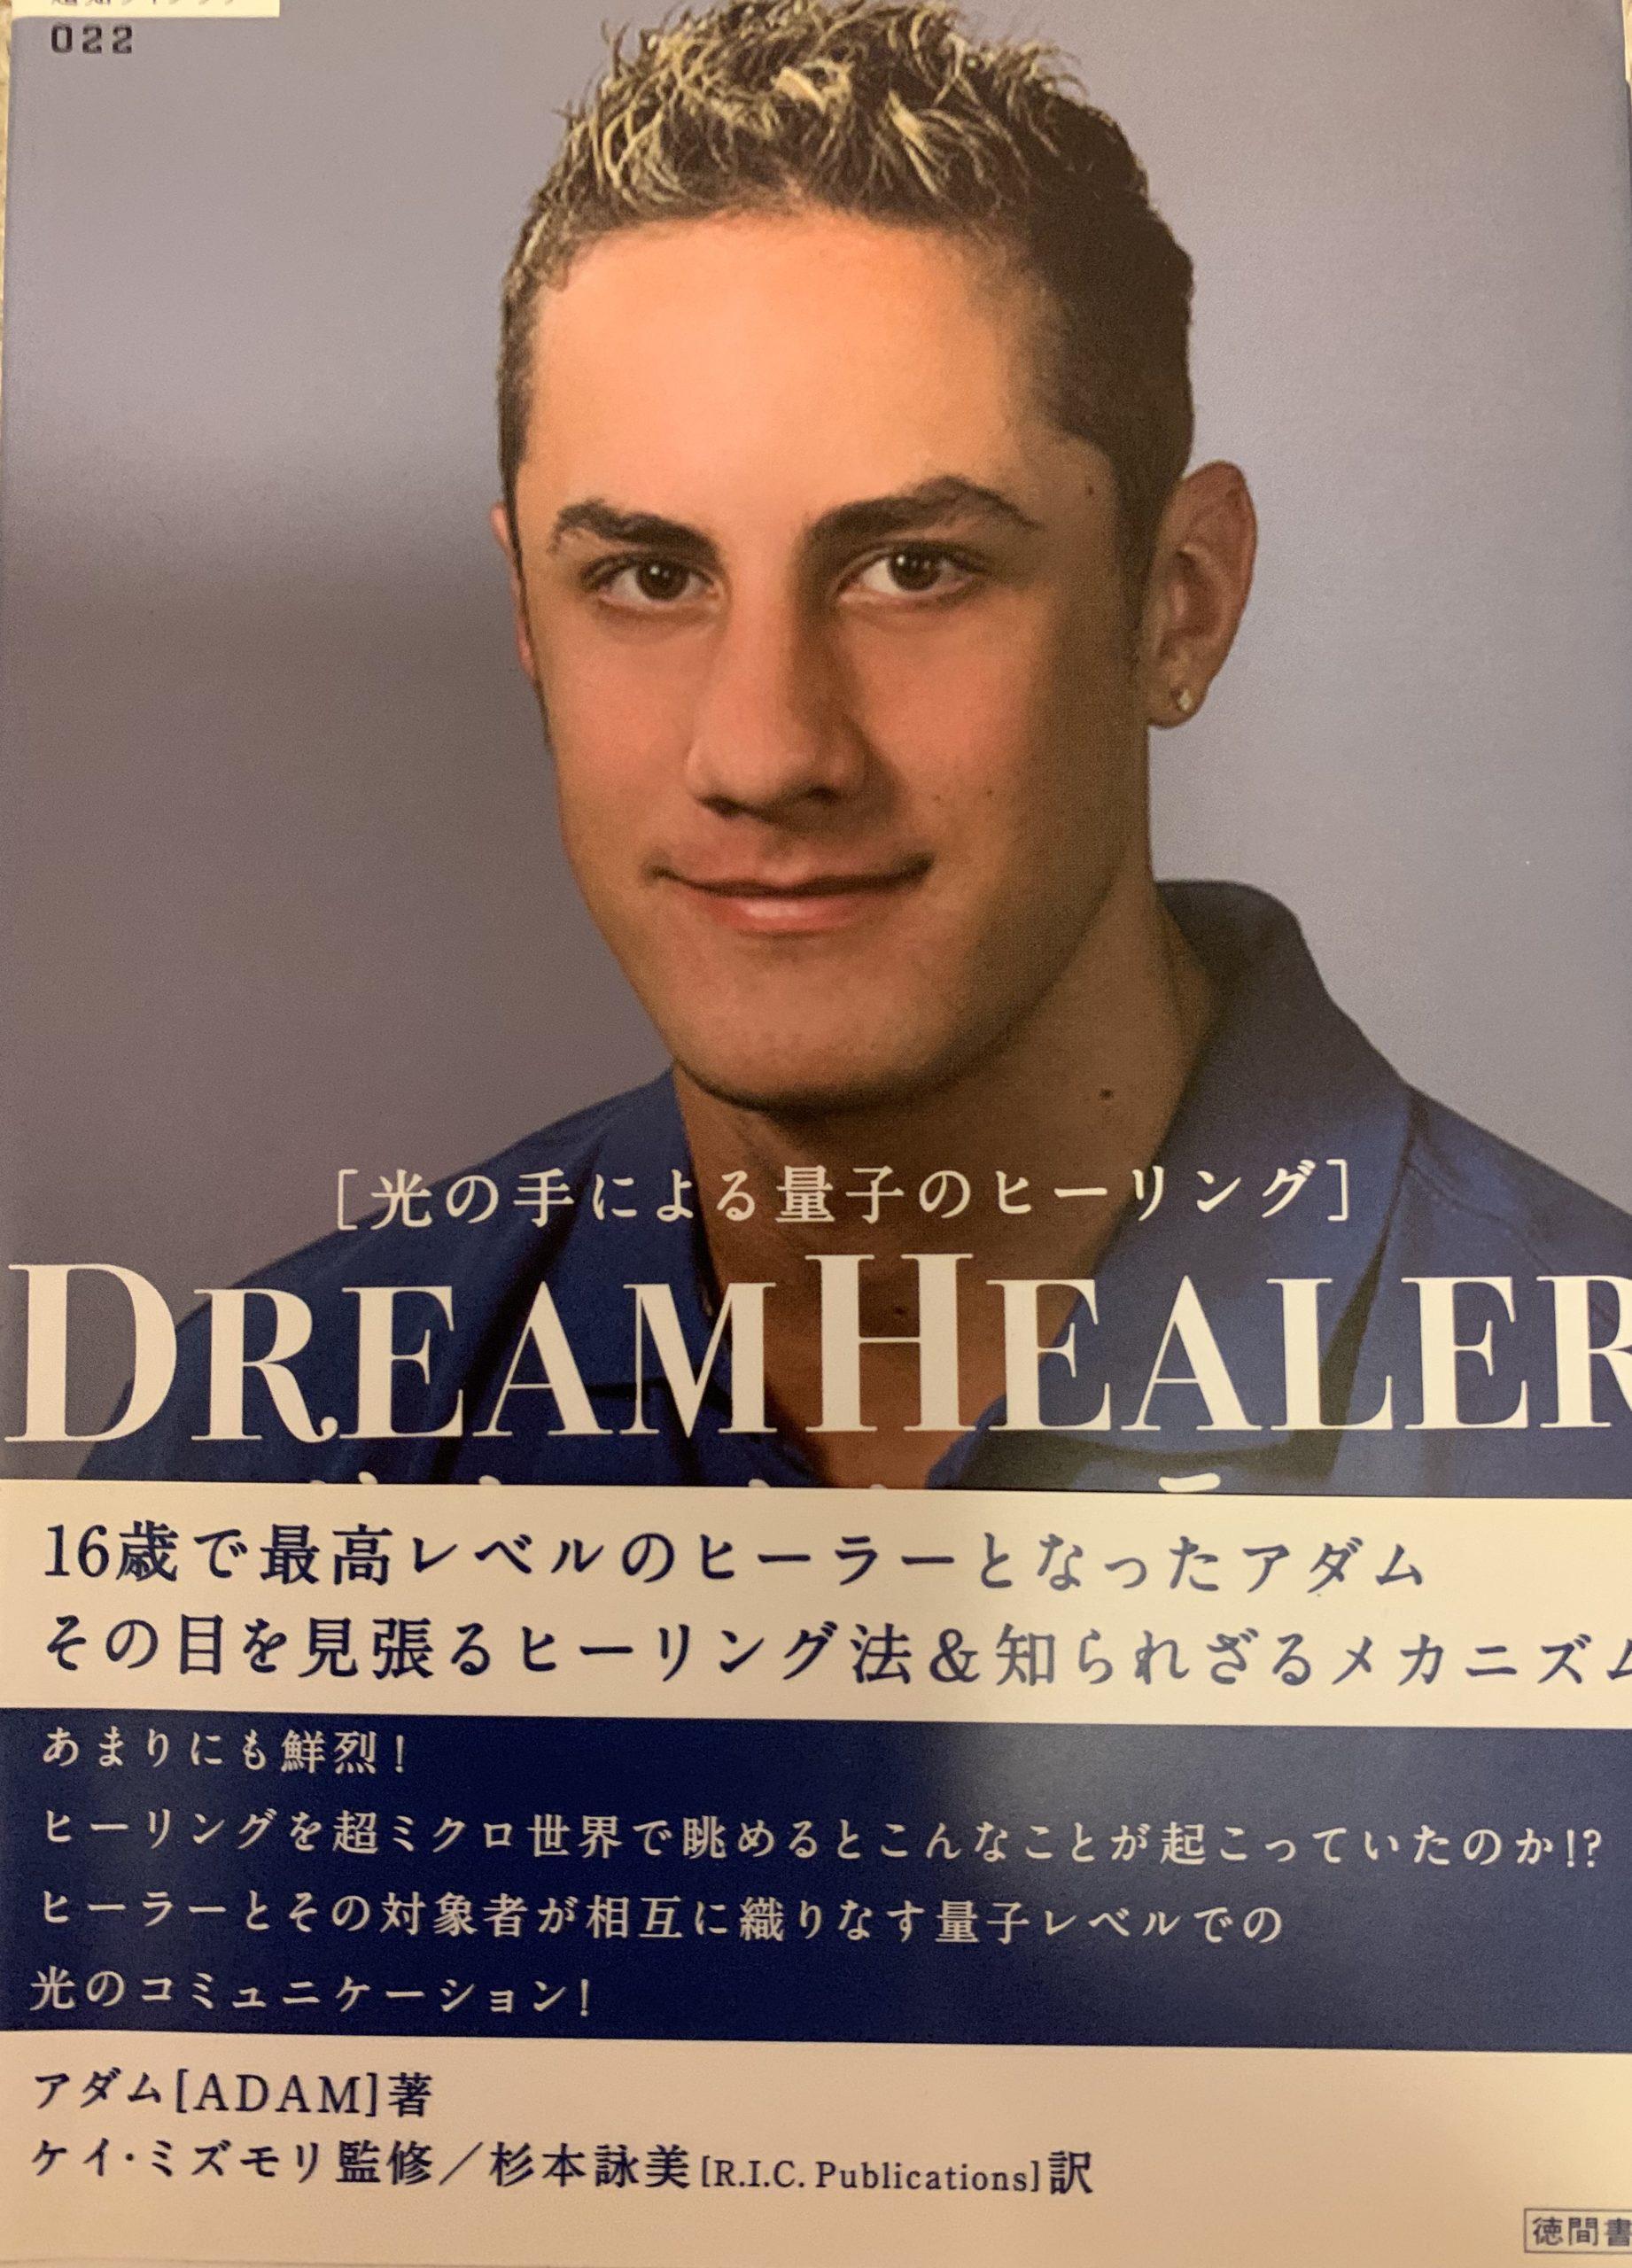 DREAM HEALER